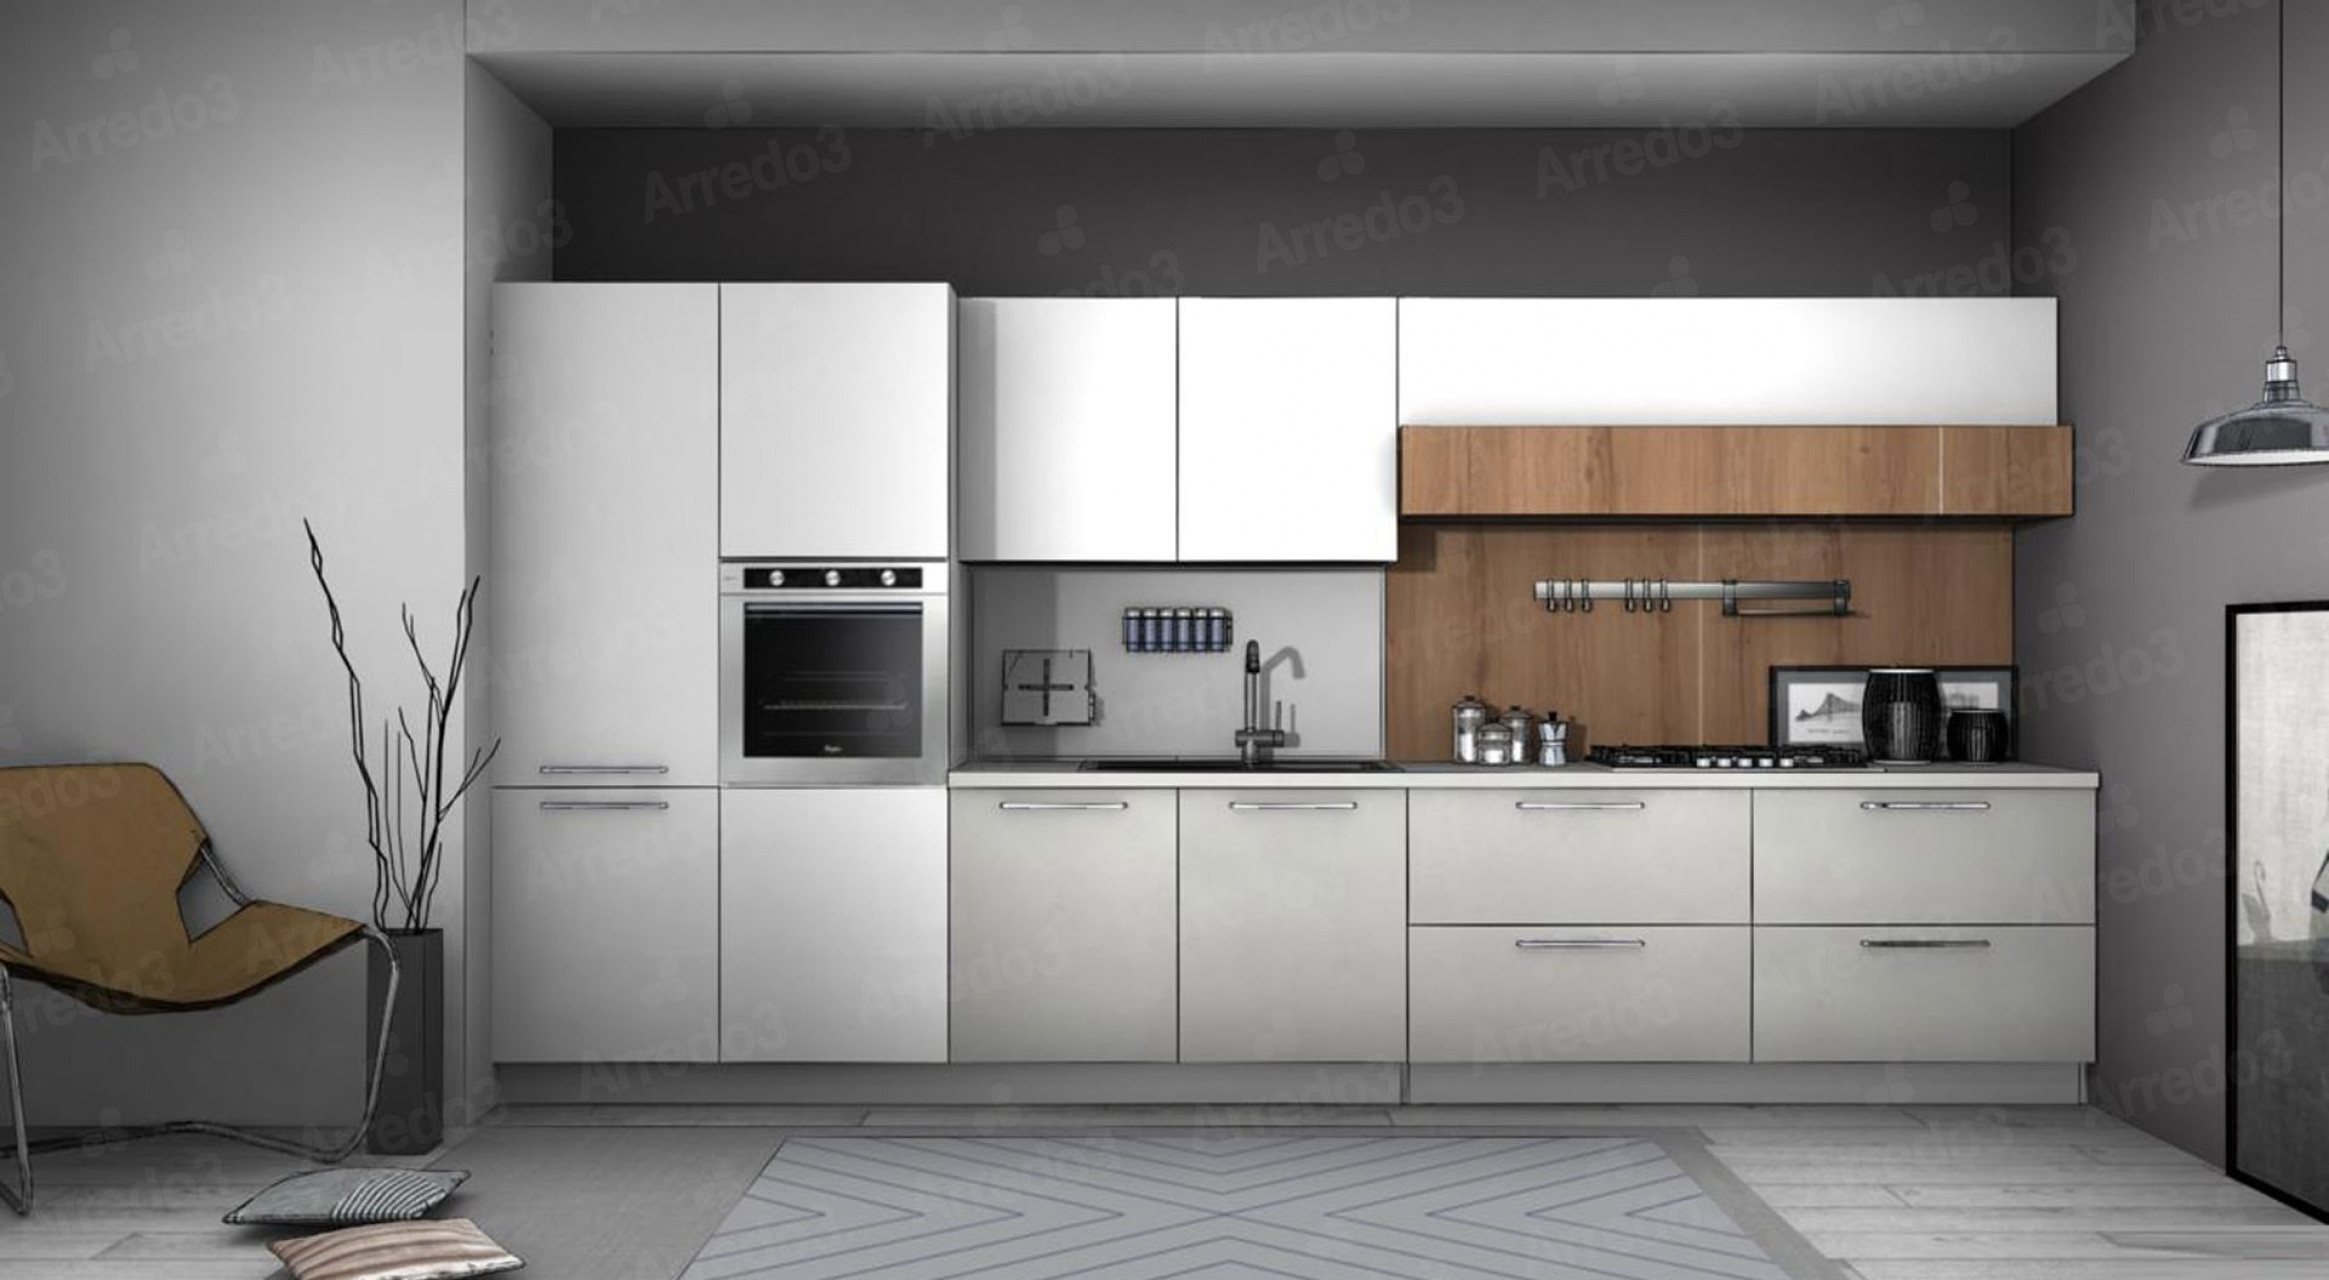 Итальянская Кухня CLOE LM01 | Цена на Кухня CLOE LM01 ARREDO3